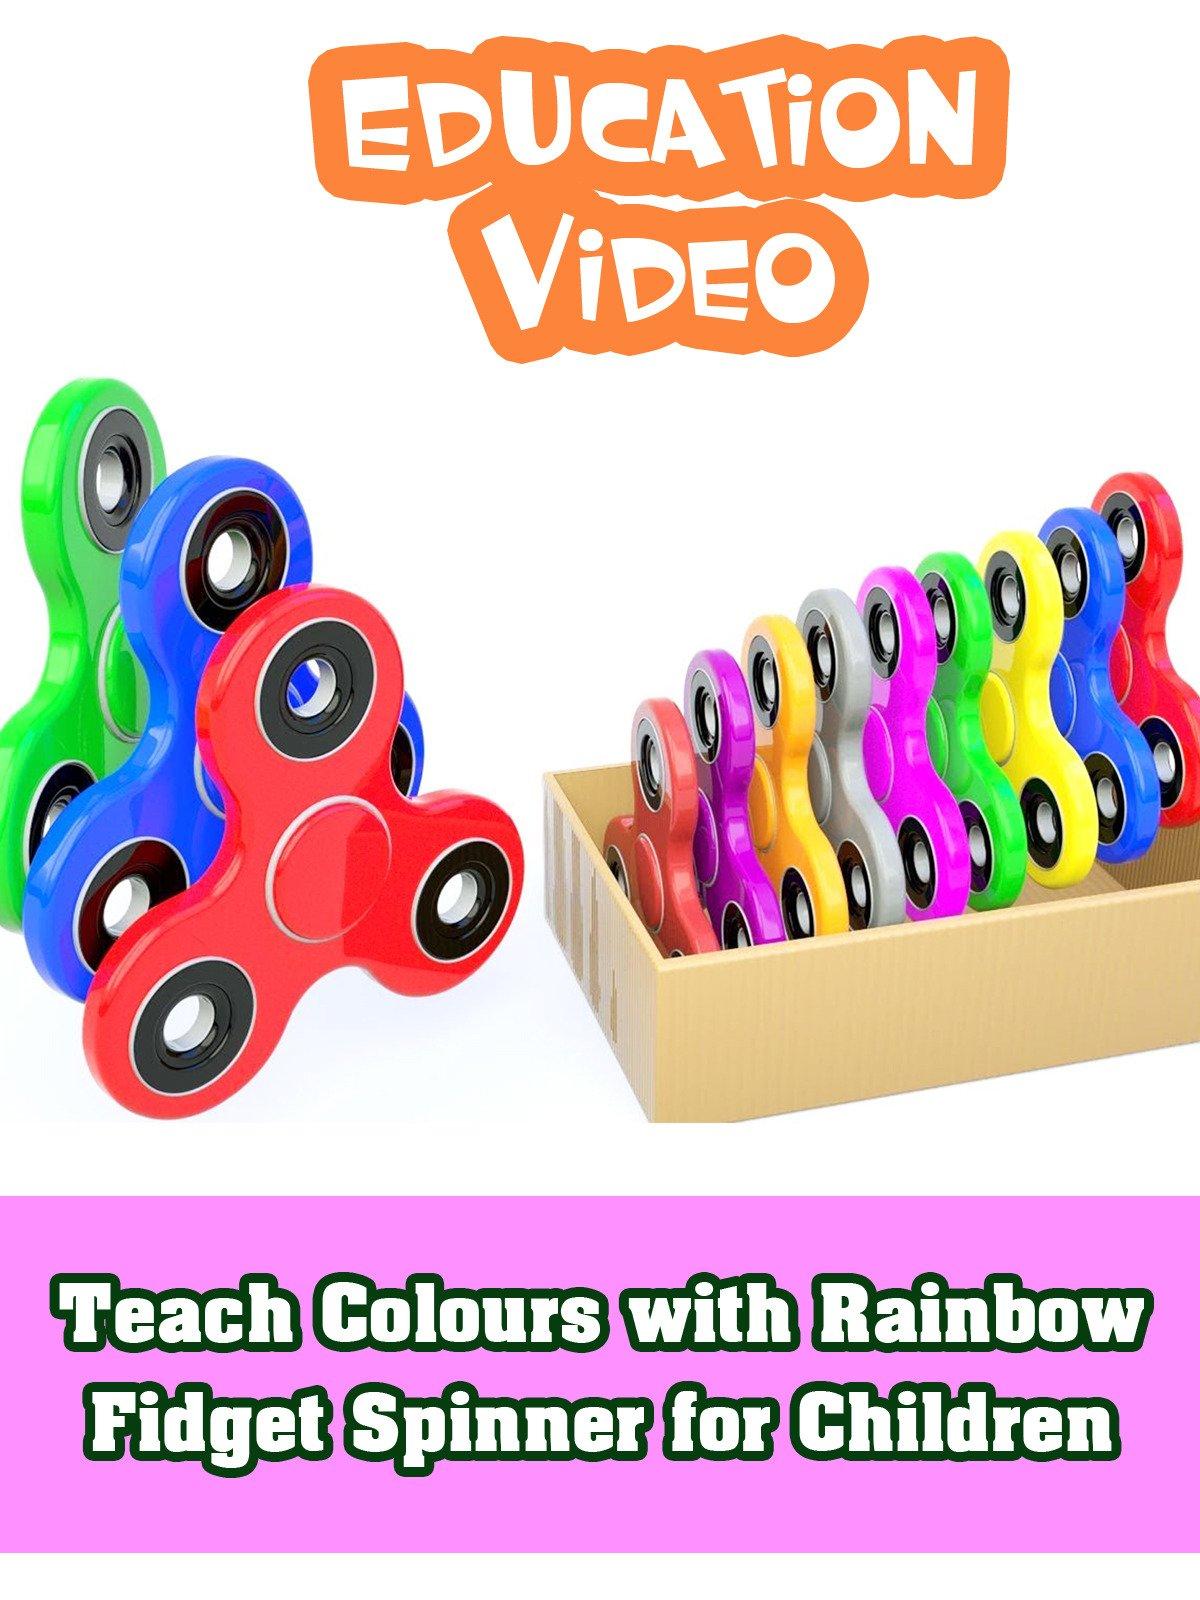 Teach Colours with Rainbow Fidget Spinner for Children